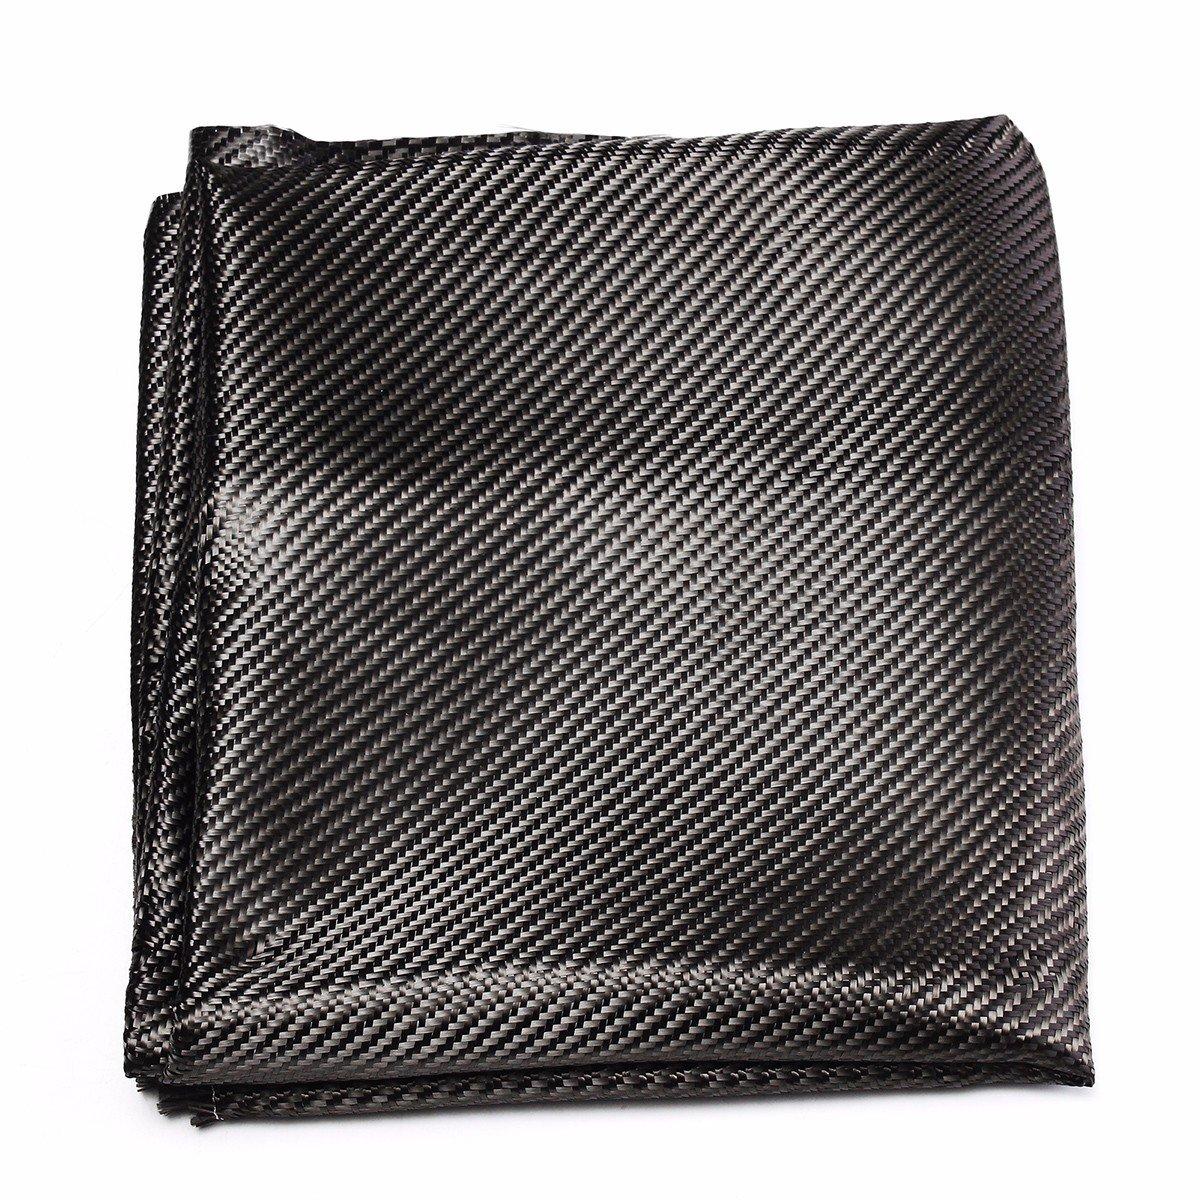 ChaRLes Carbon Fiber Fabric Tuch 3K Twill Weave 127x91cm